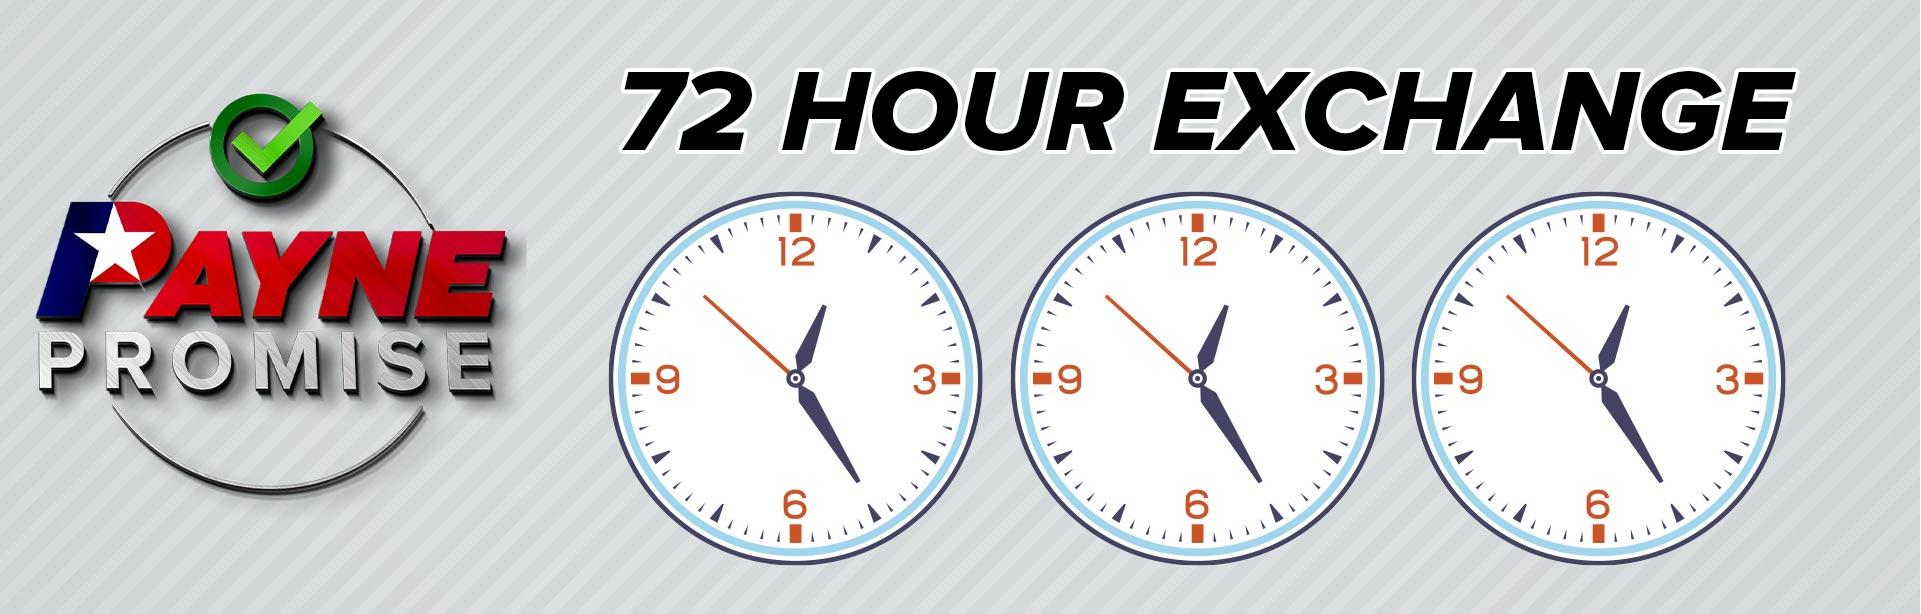 72 Hour Exchange